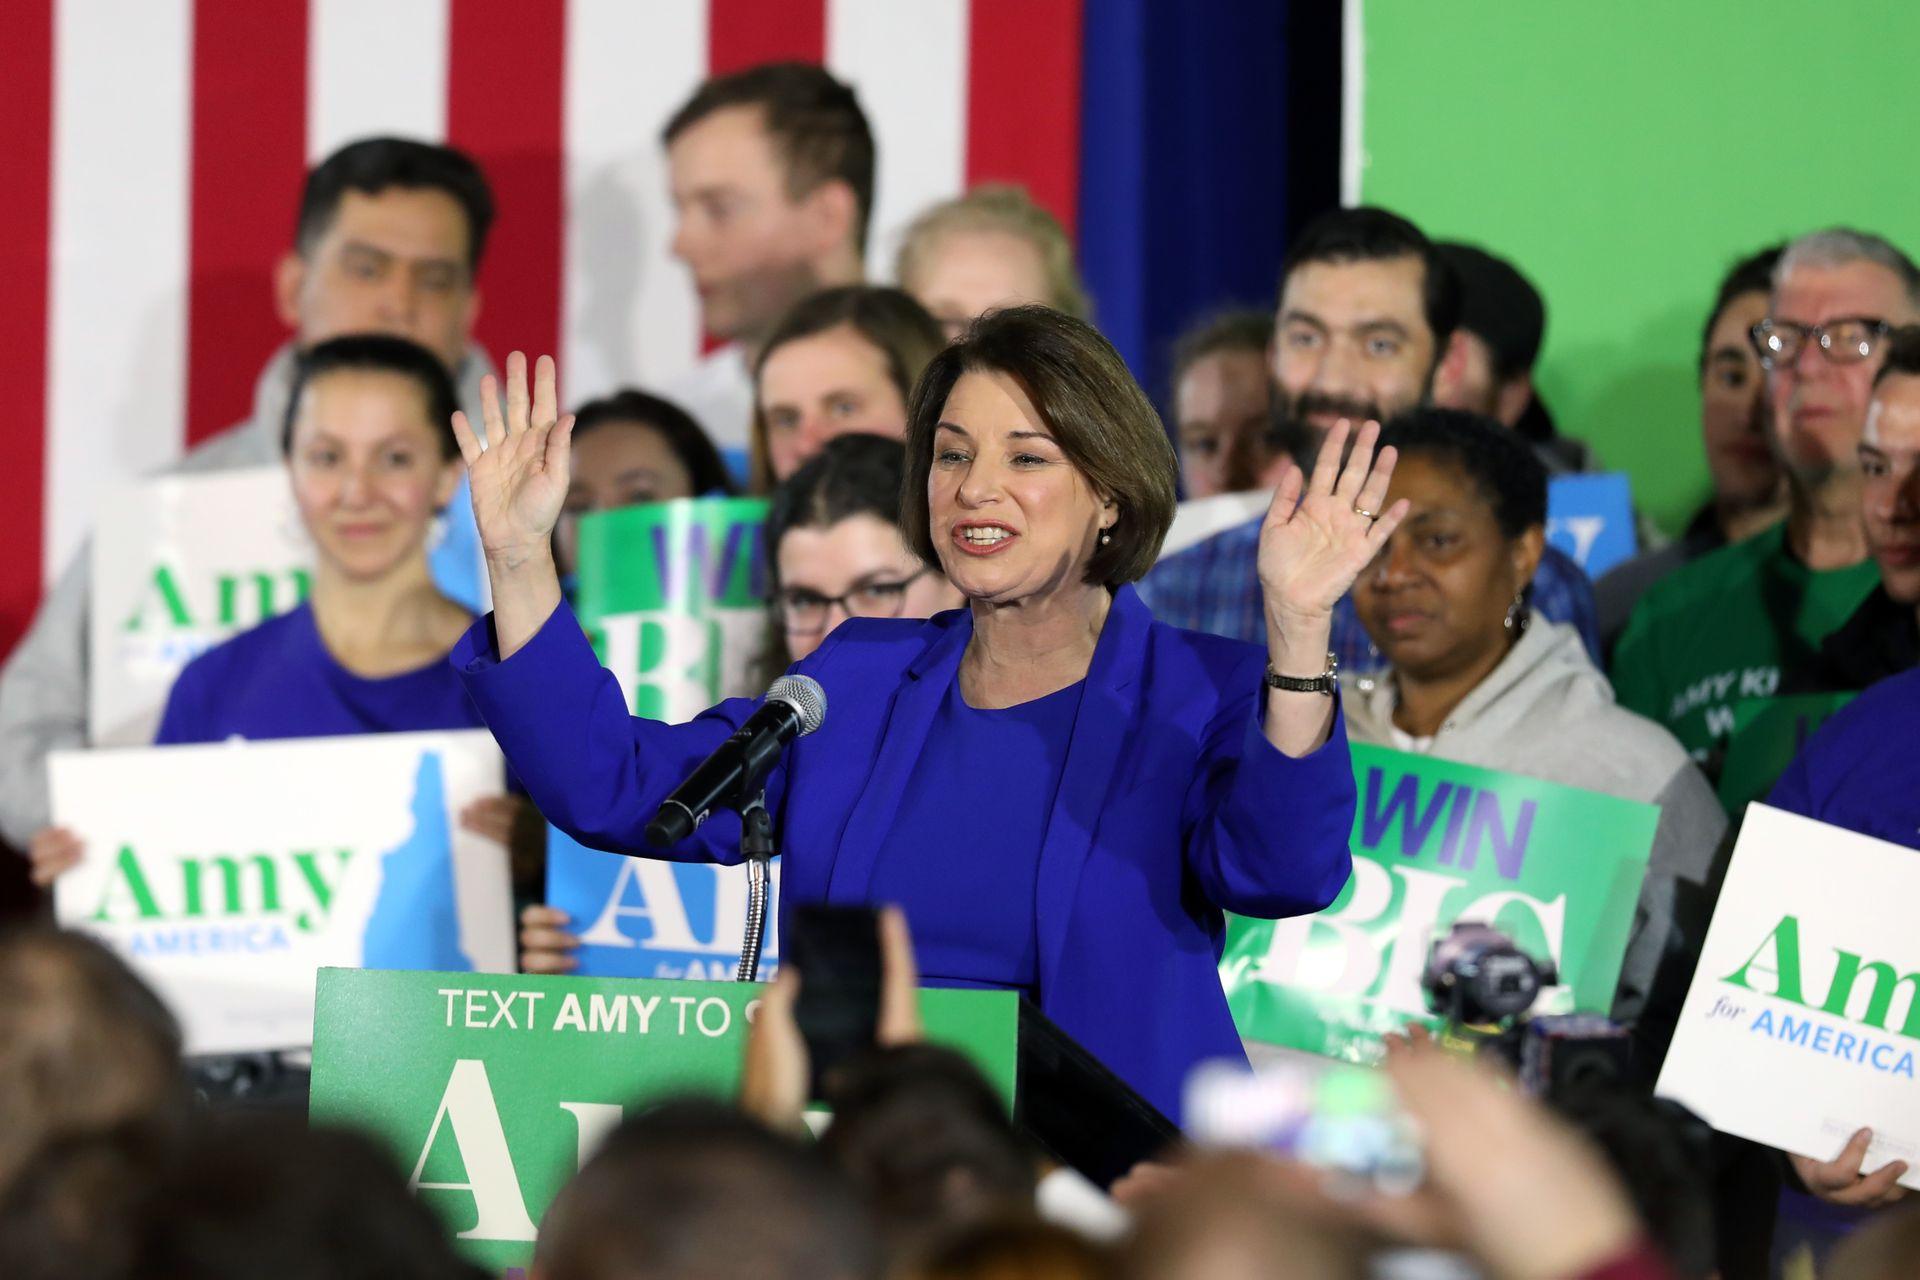 Klobuchar says she has raised $12 million since New Hampshire debate